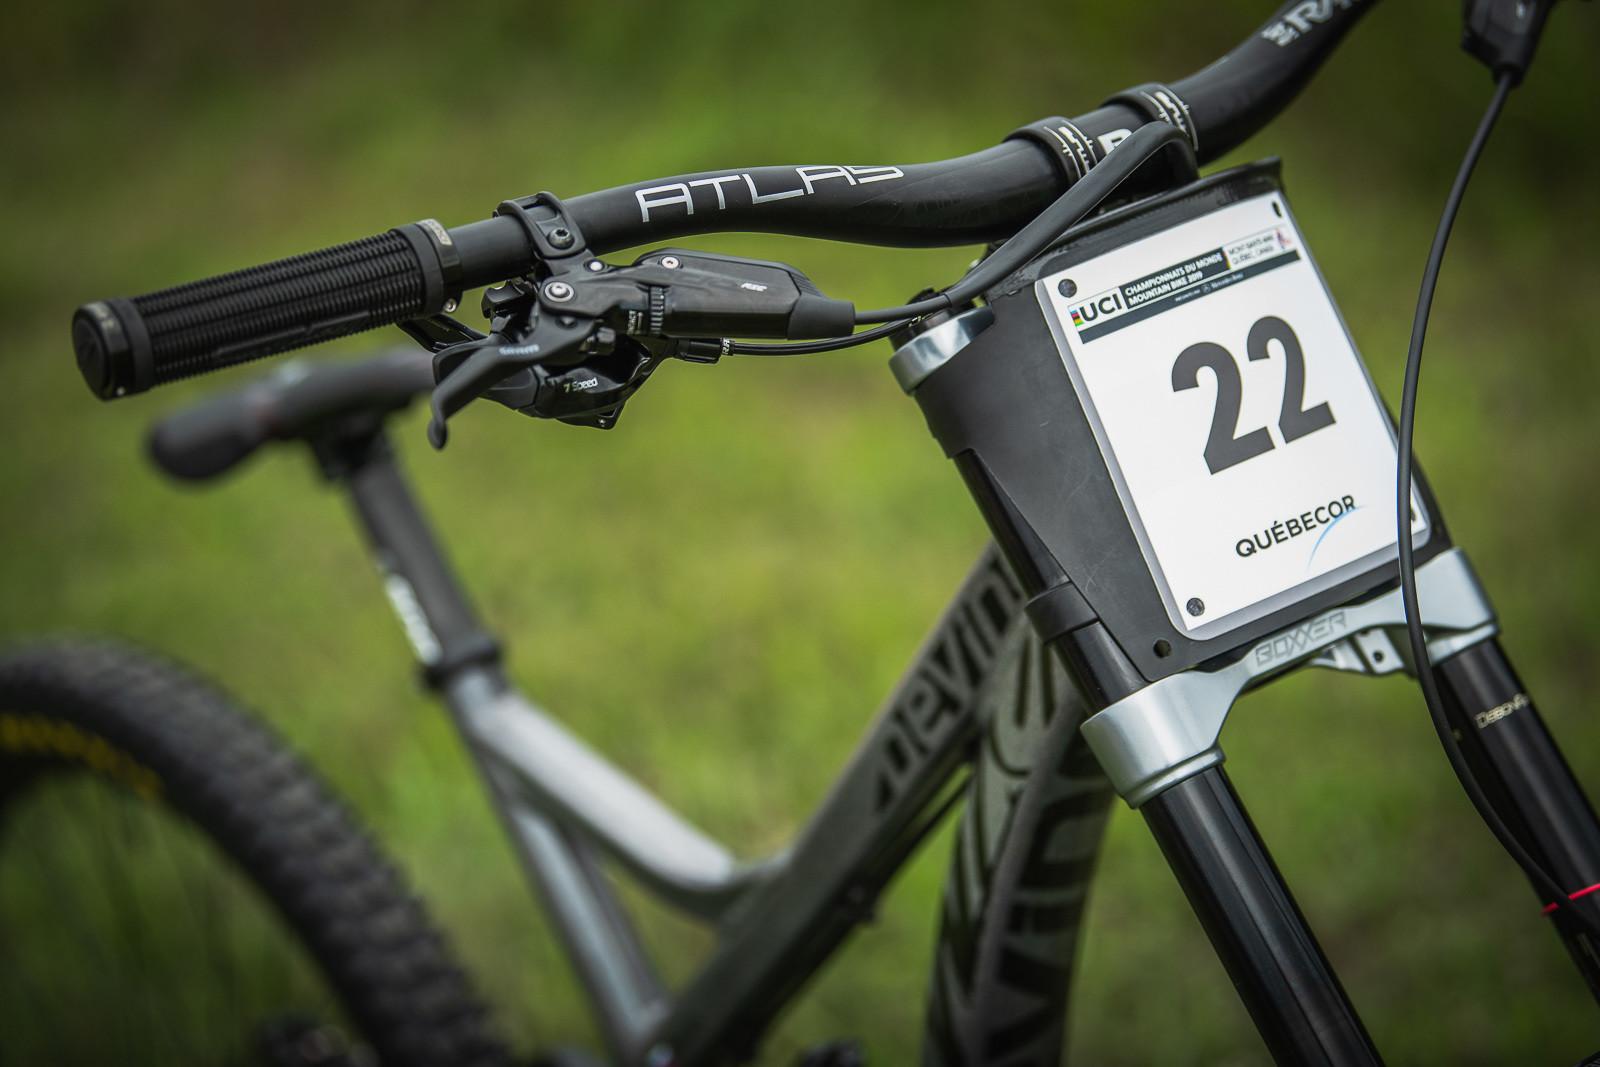 Stealth Monochrome Look for Jure - Devinci Unior World Championships Downhill Race Bikes - Mountain Biking Pictures - Vital MTB